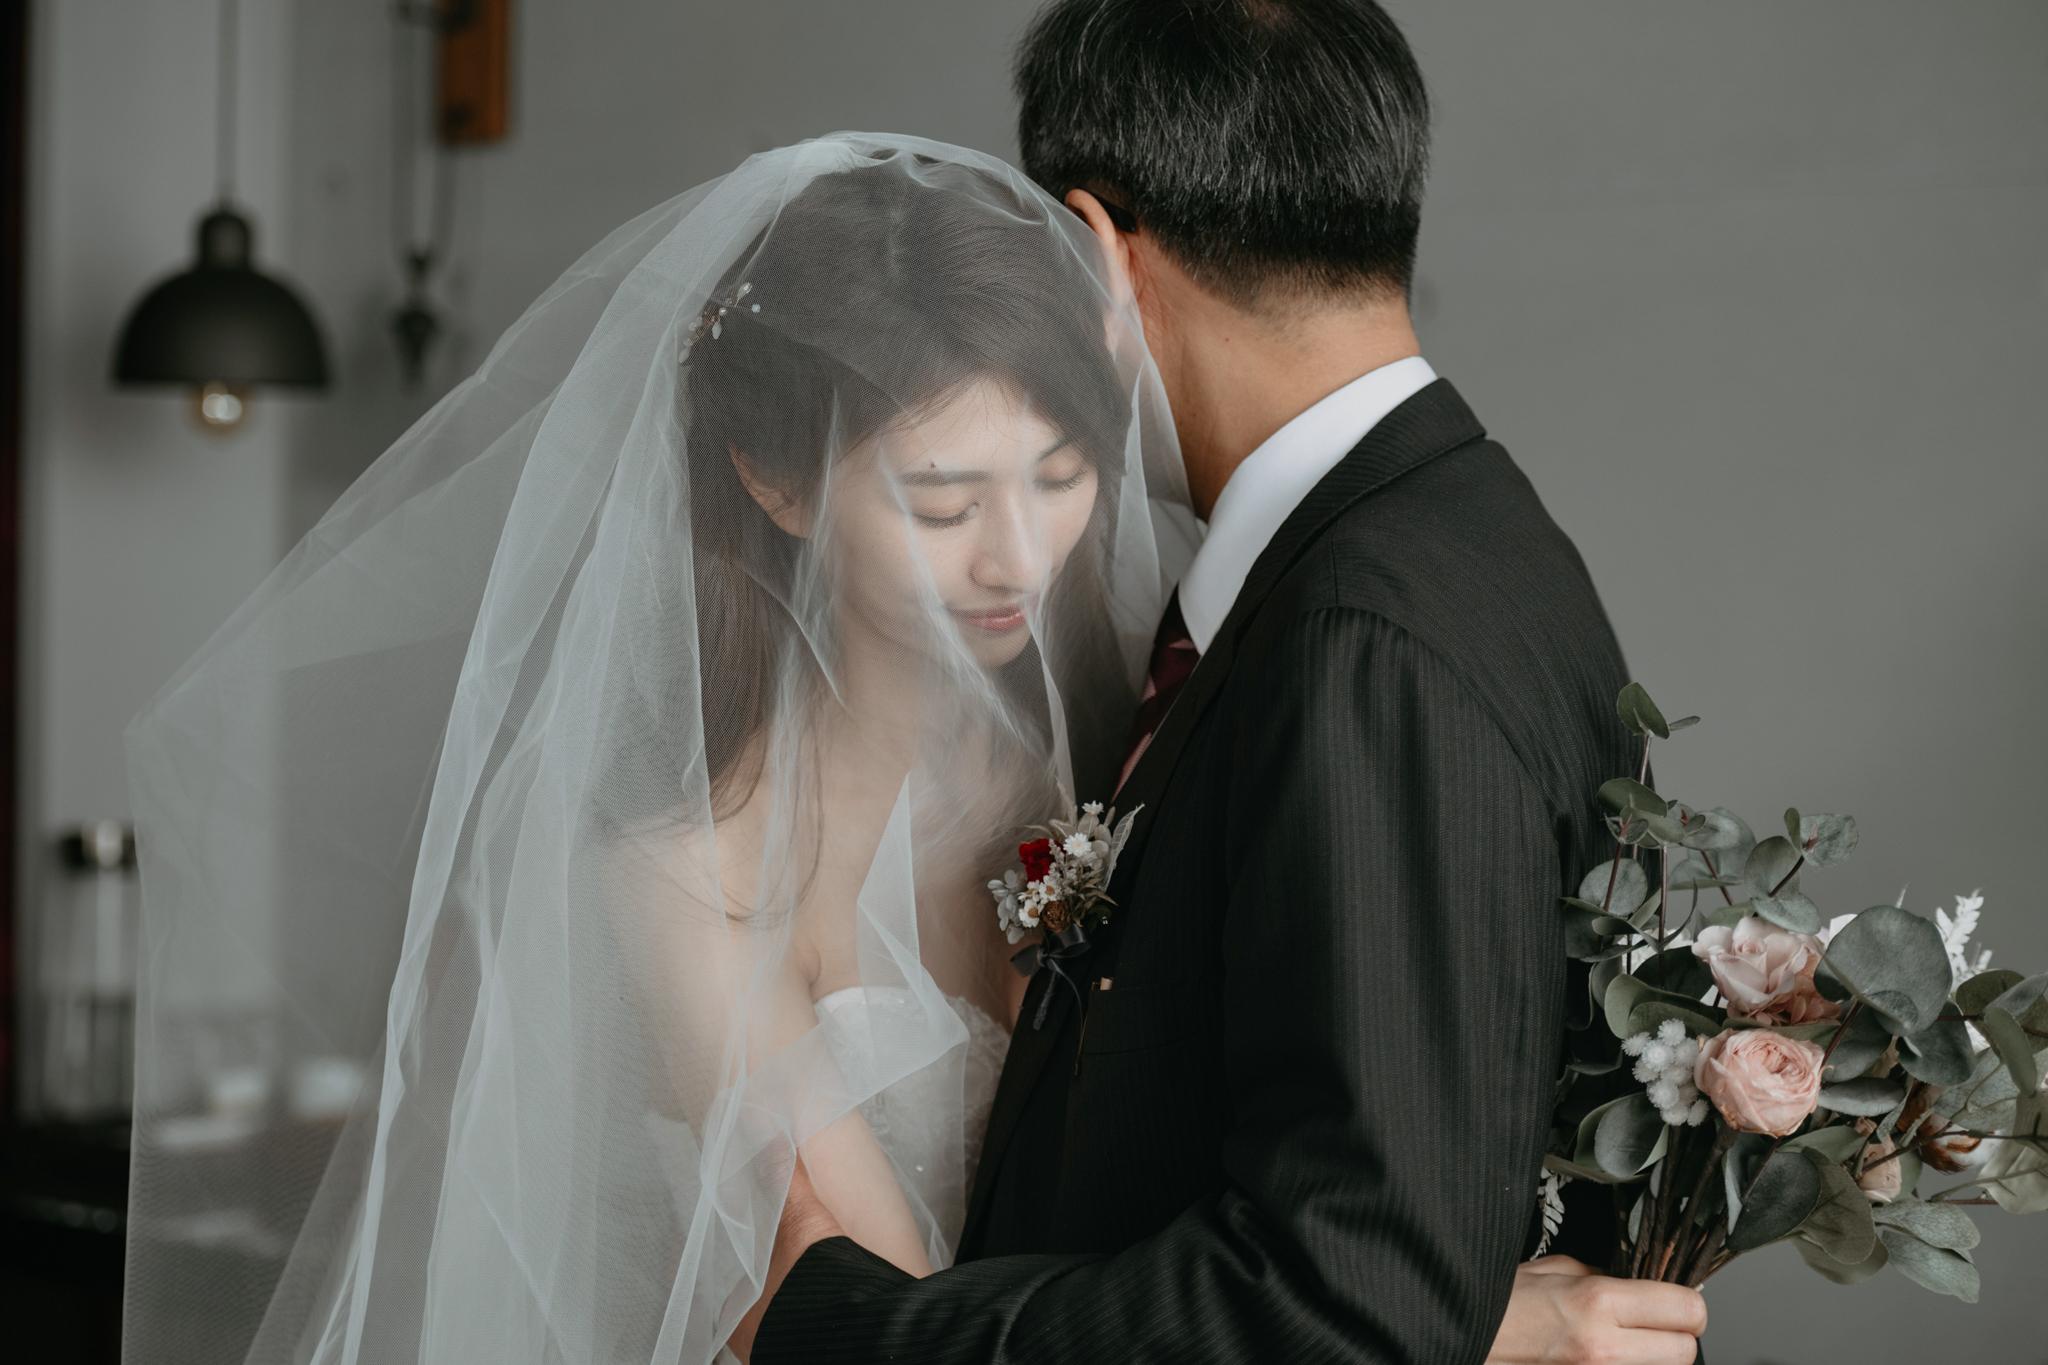 EASTERN WEDDING, Donfer, 東法, 婚禮紀錄, 萊特薇庭